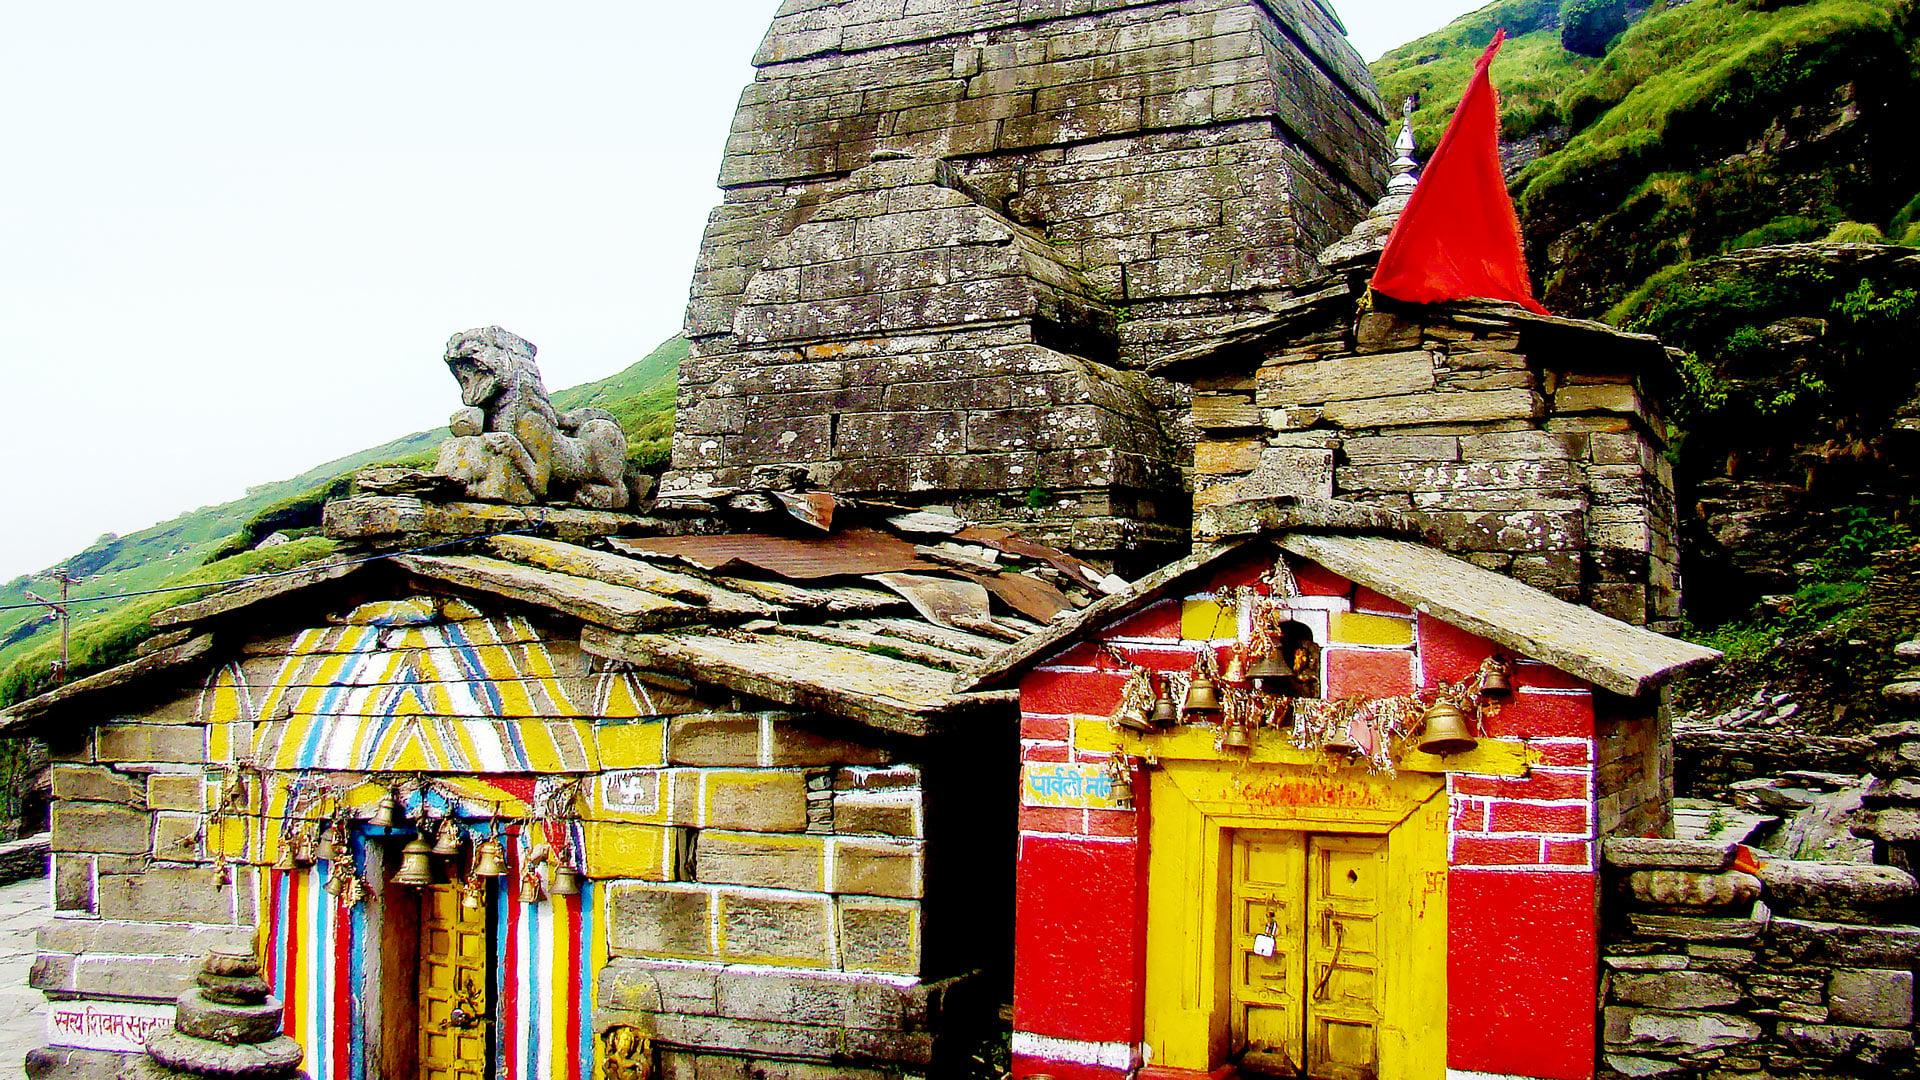 Tungnath: The Highest Shiva Temple